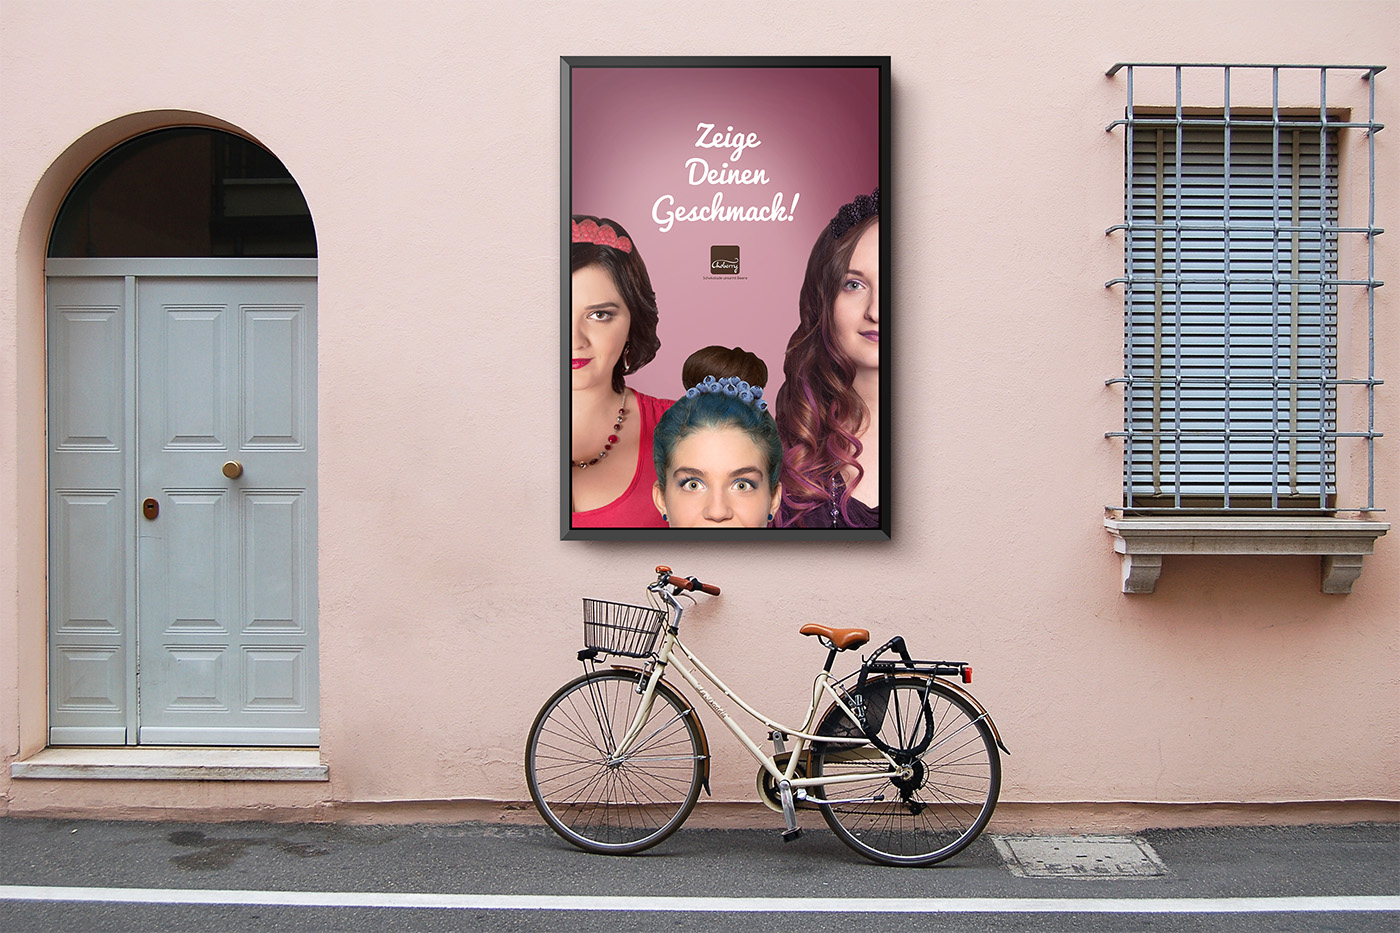 Plakatgestaltung